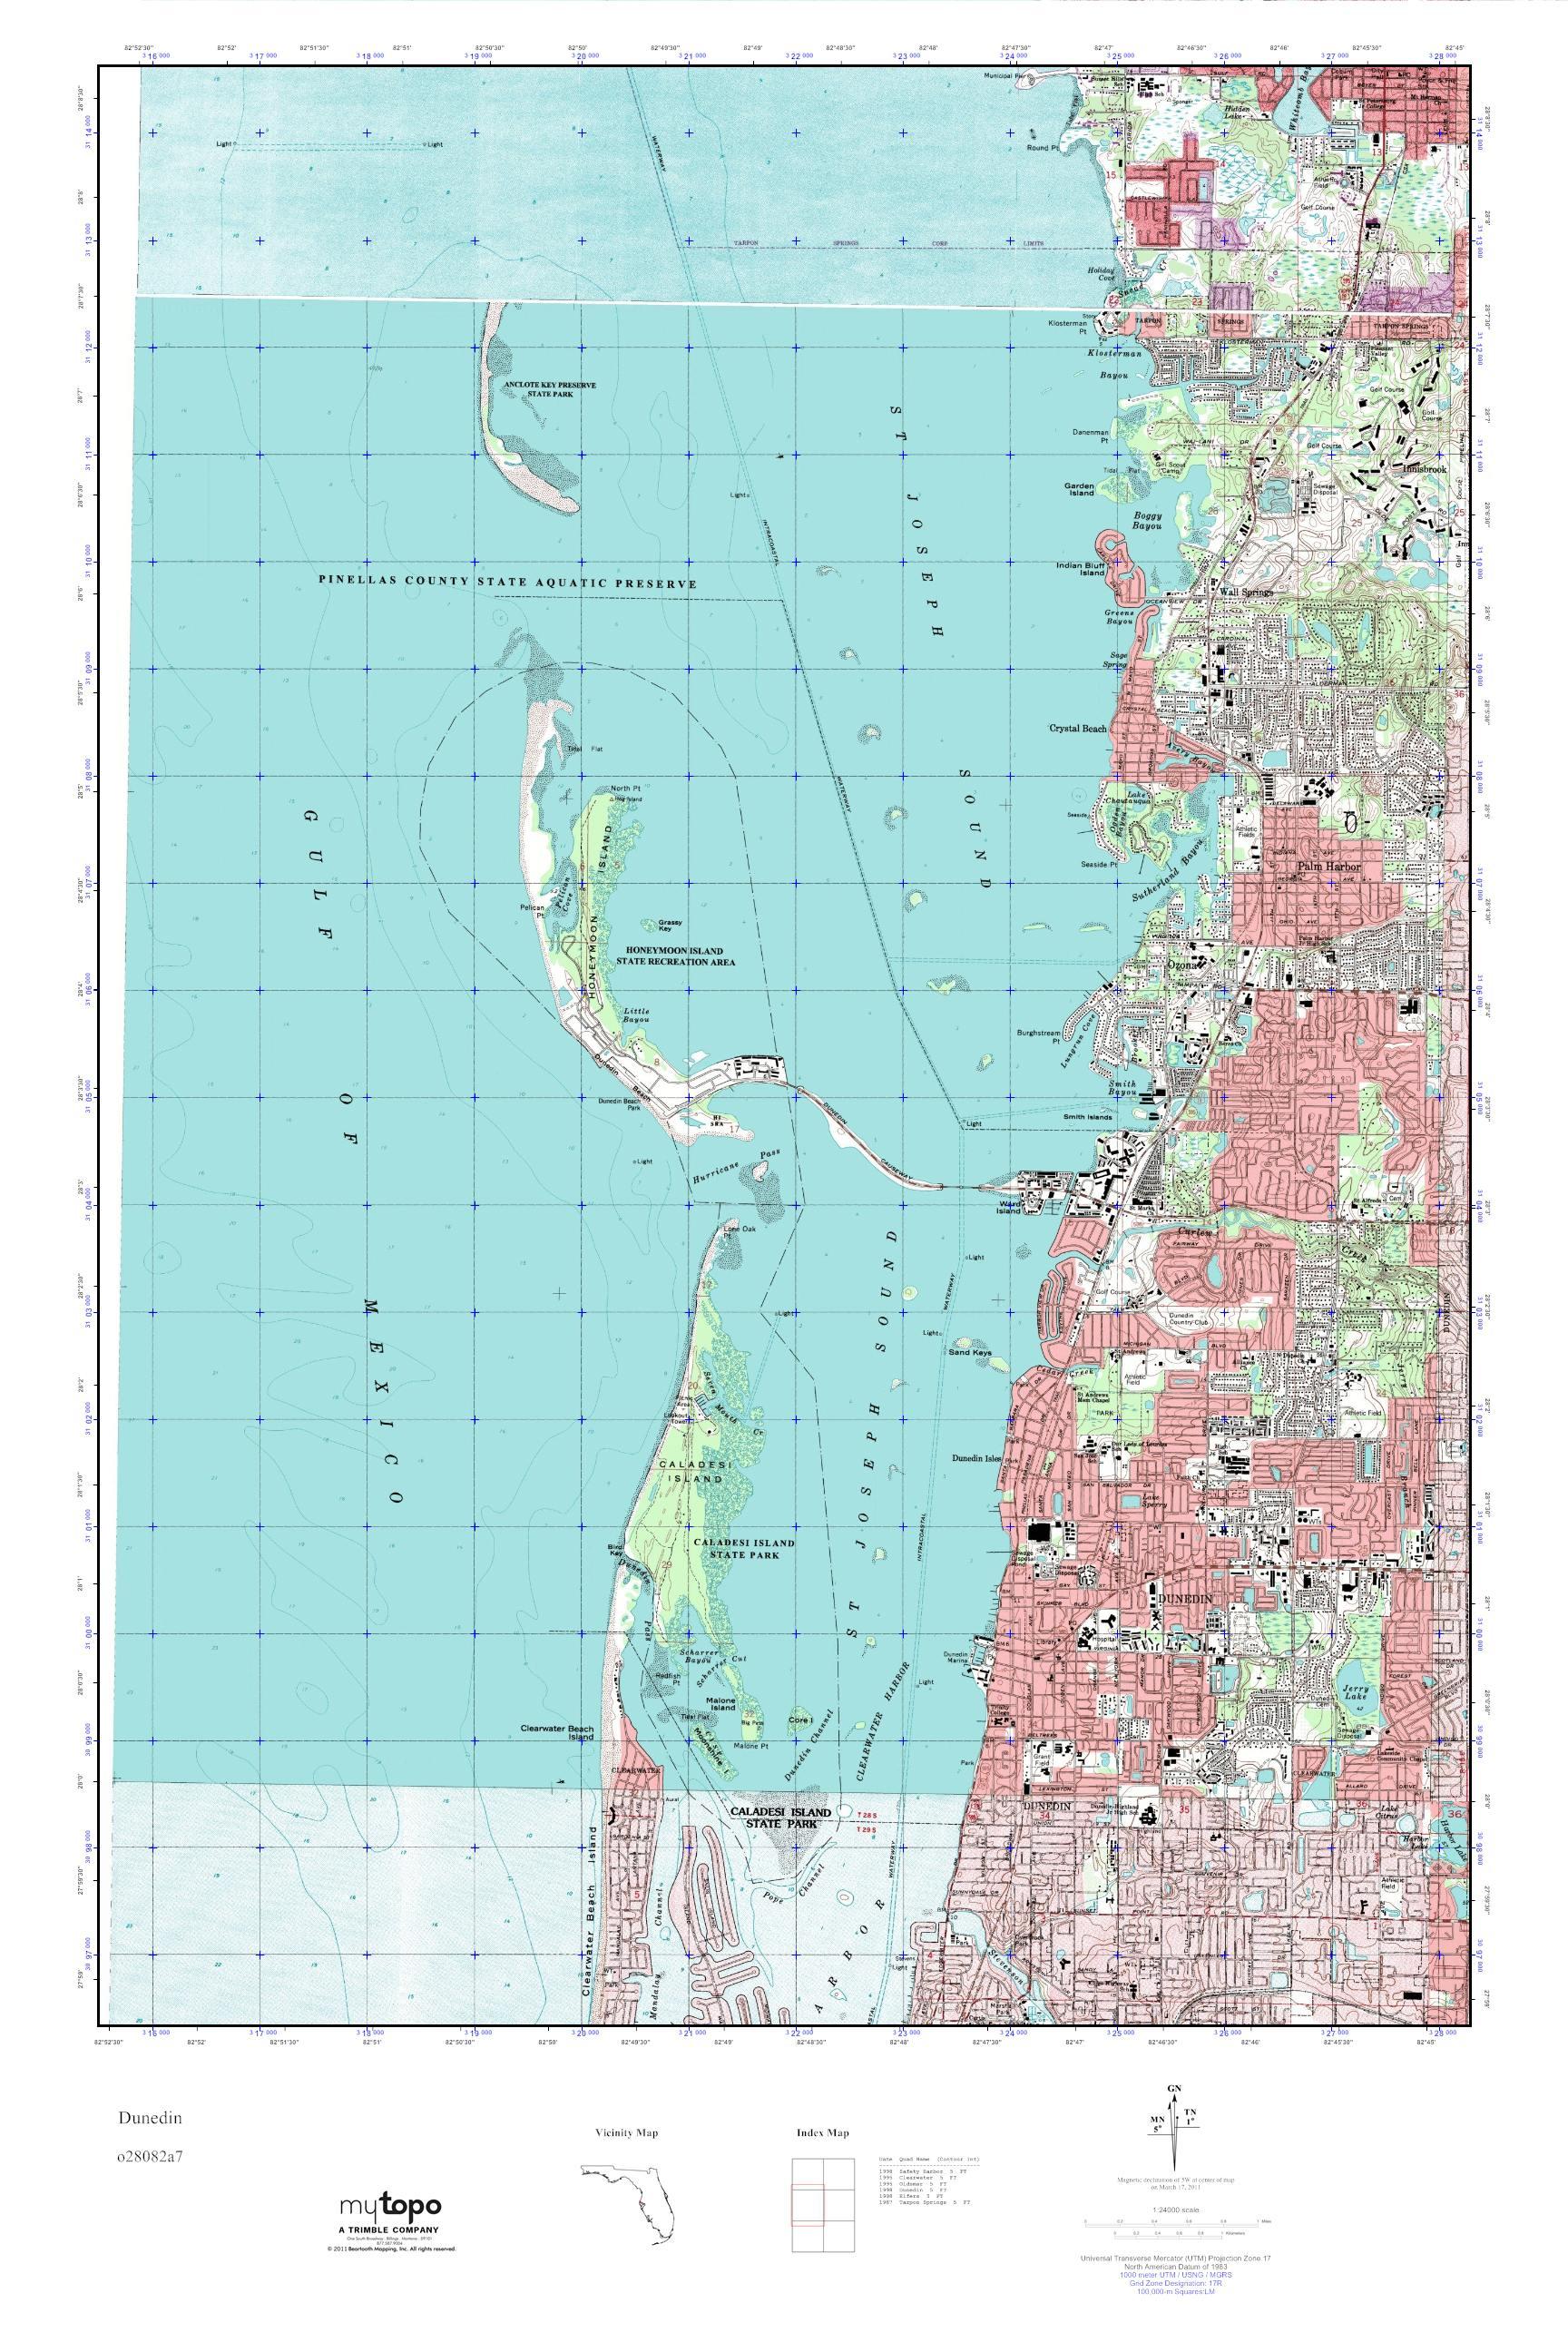 Mytopo Dunedin, Florida Usgs Quad Topo Map - Usgs Topographic Maps Florida